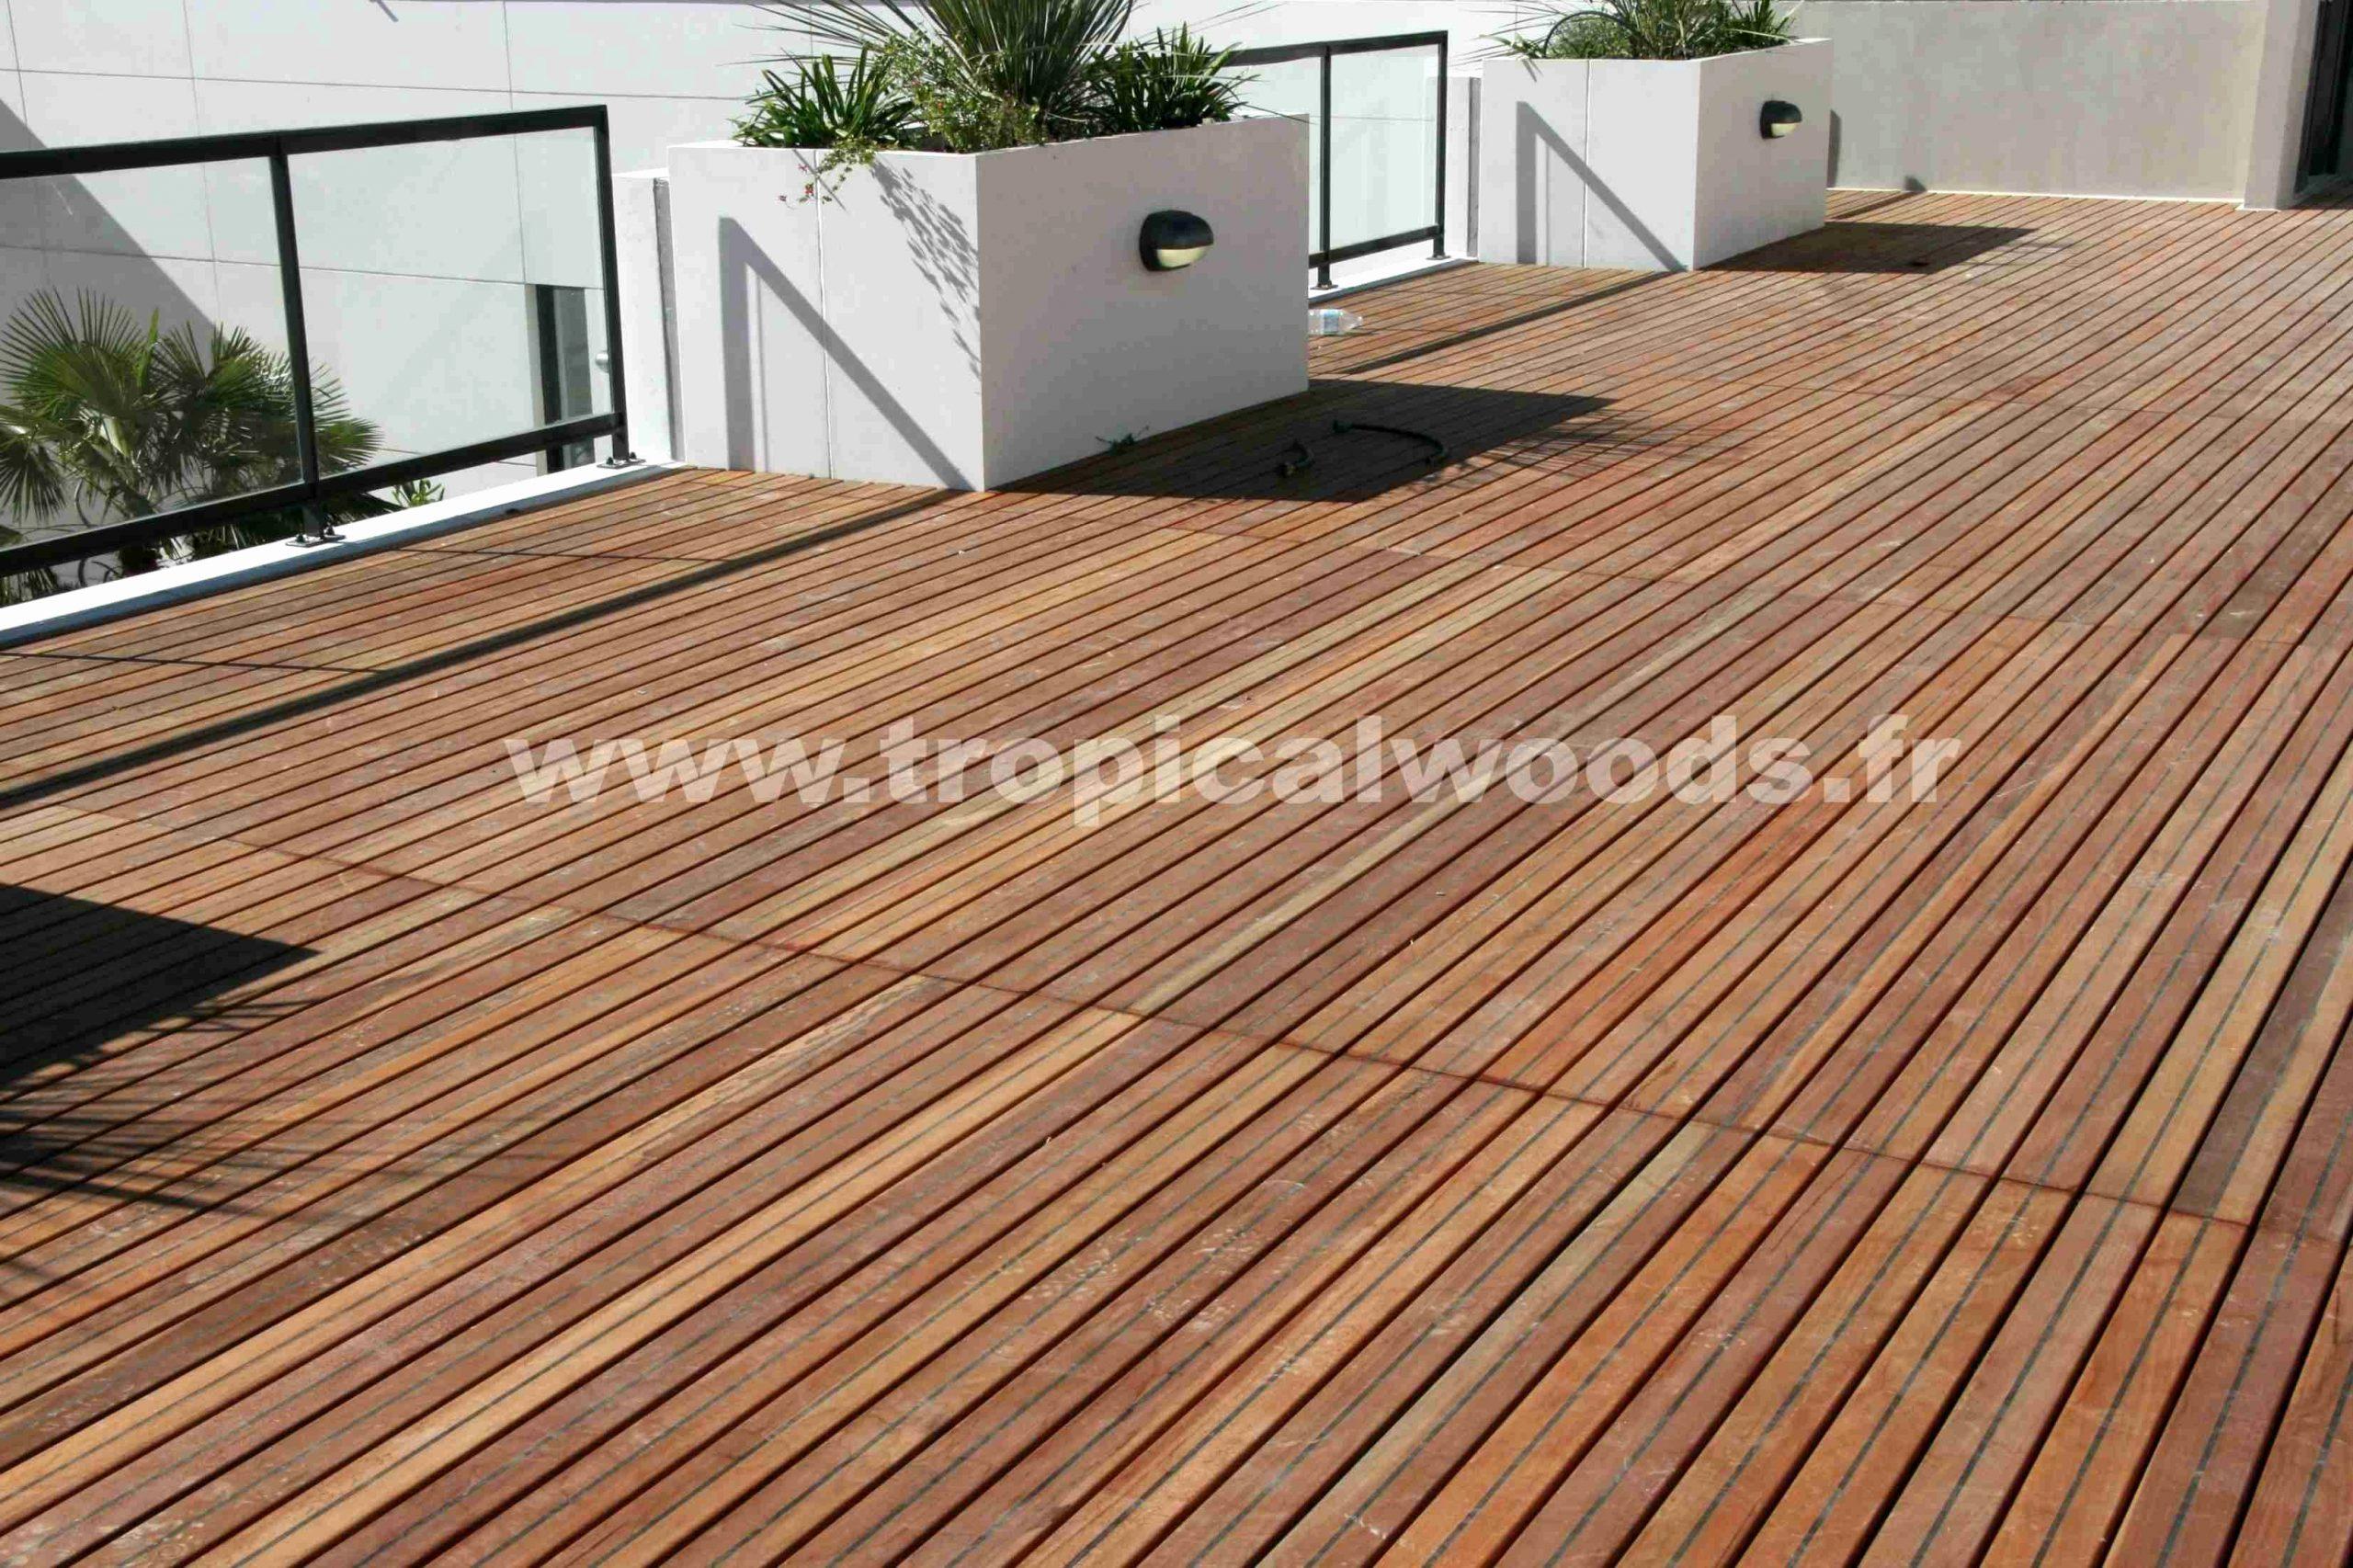 Carrelage Terrasse Brico Depot | Venus Et Judes encequiconcerne Plot Reglable Terrasse Brico Depot